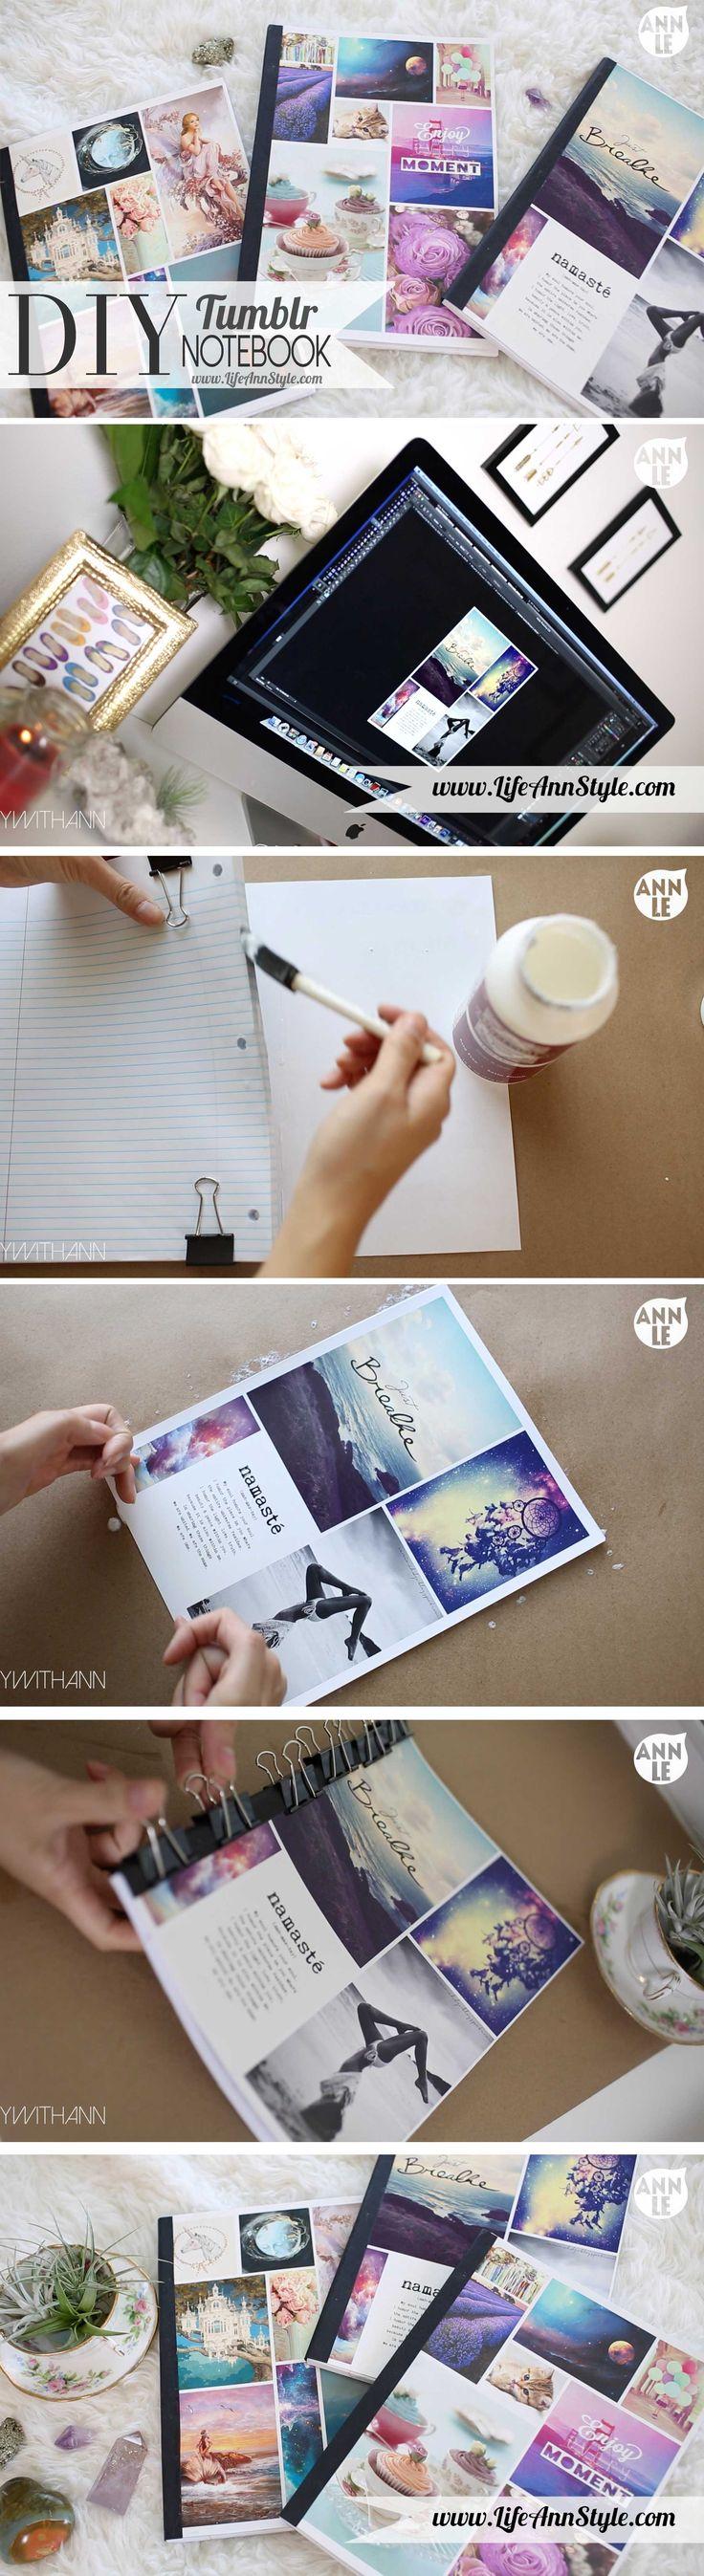 DIY Tumblr Inspired Notebooks! | lifestyle #BacktoSchool #DIY SOOO CUTE!!!